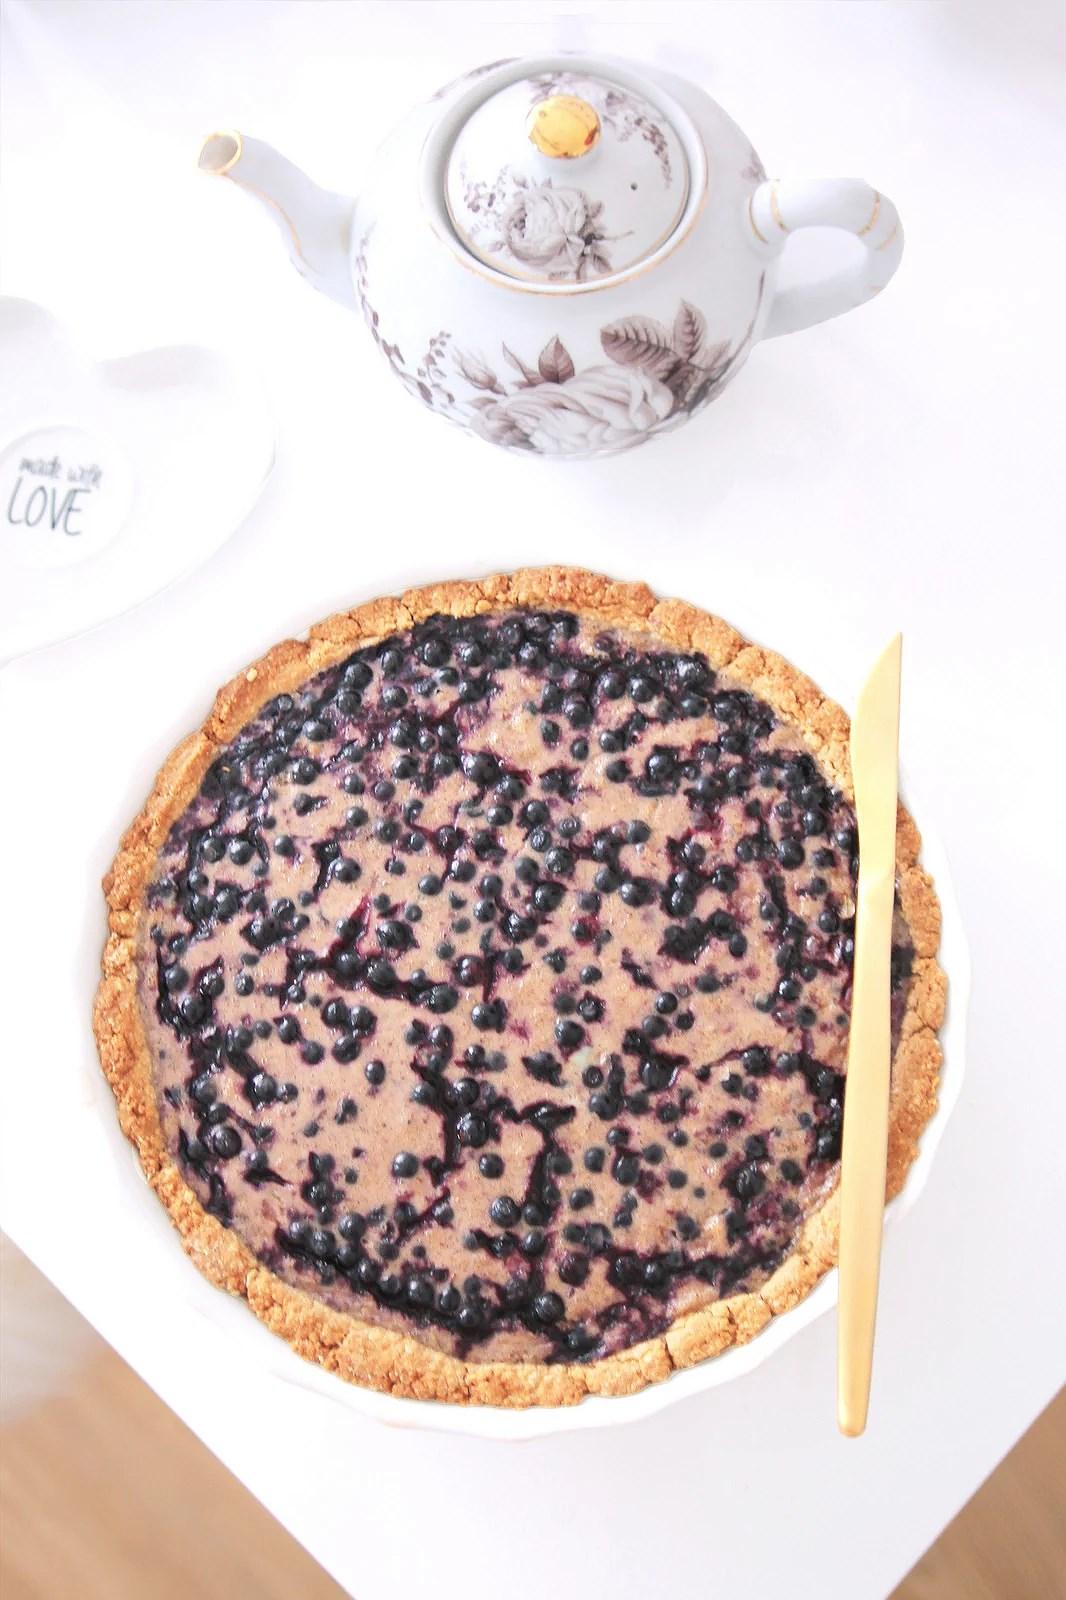 Blueberry pie (wheat & dairy free)